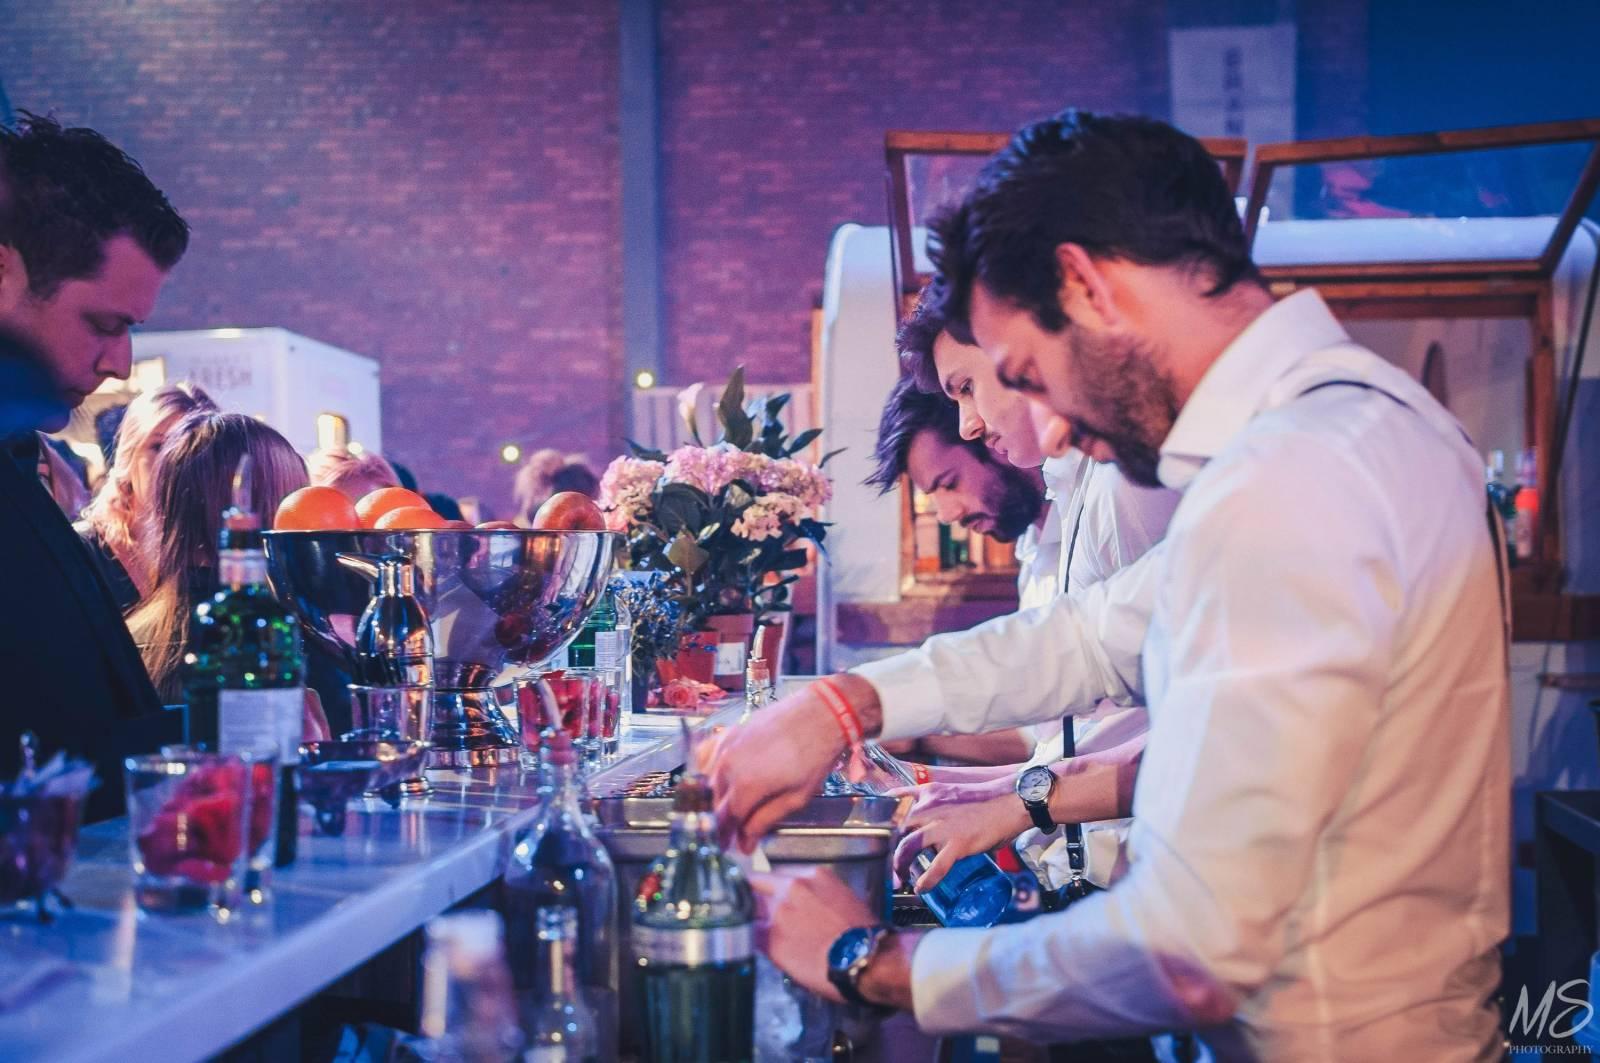 Miraeus - Cocktails - Mobiele Bars - House of Weddings - 3